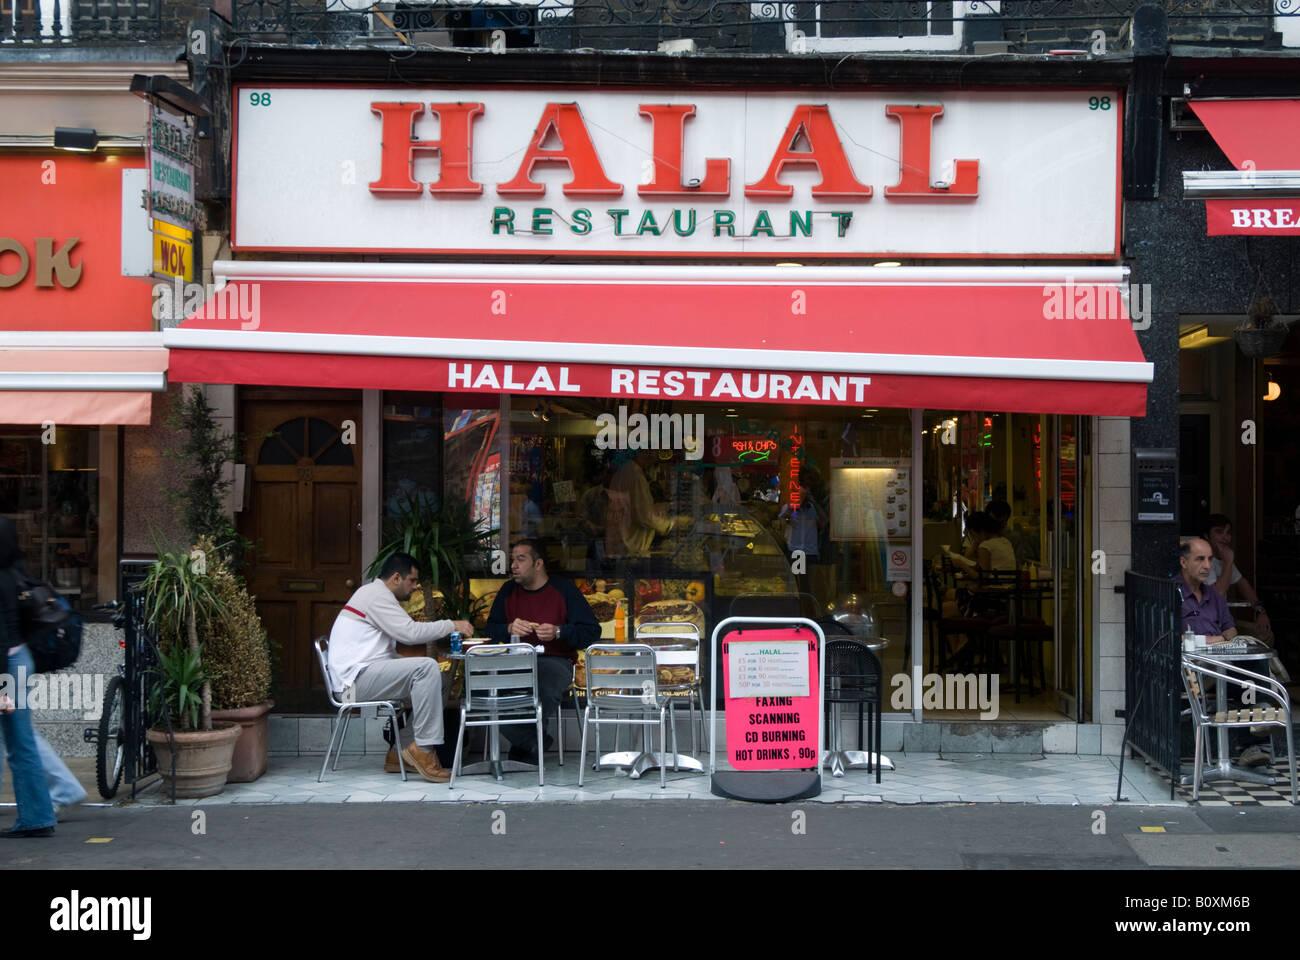 Halal Restaurants In Central London